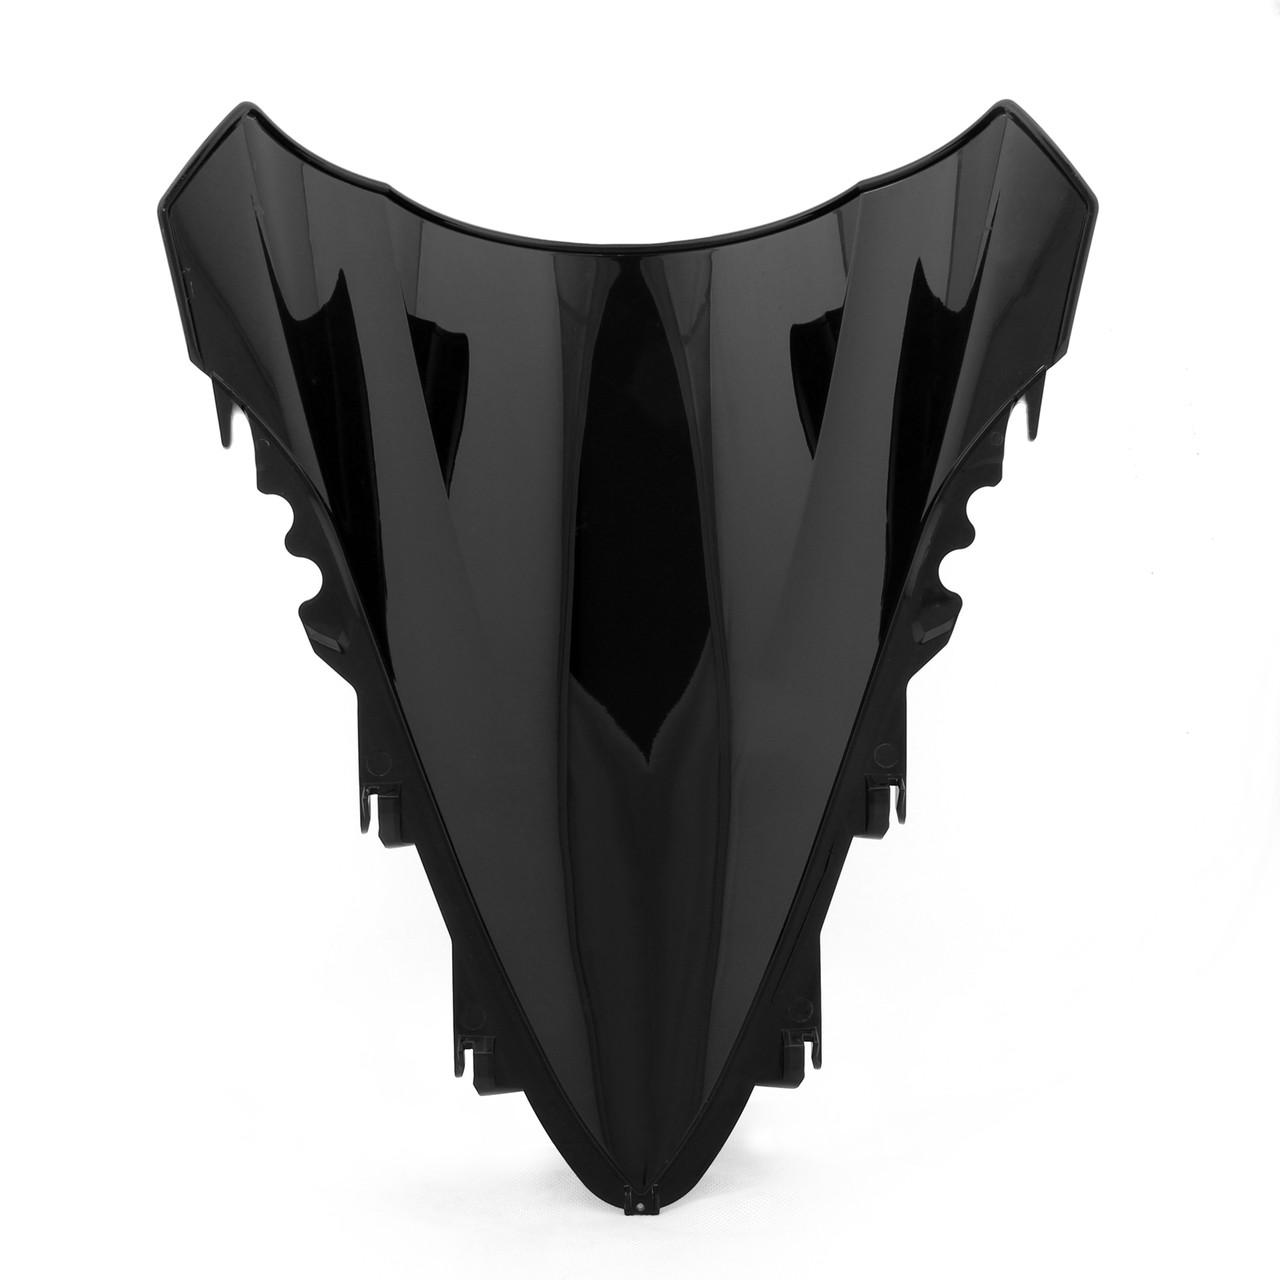 http://www.madhornets.store/AMZ/MotoPart/Windshield/Yamaha/WIN-Y402/WIN-Y402-Iridium-2.jpg?refresh